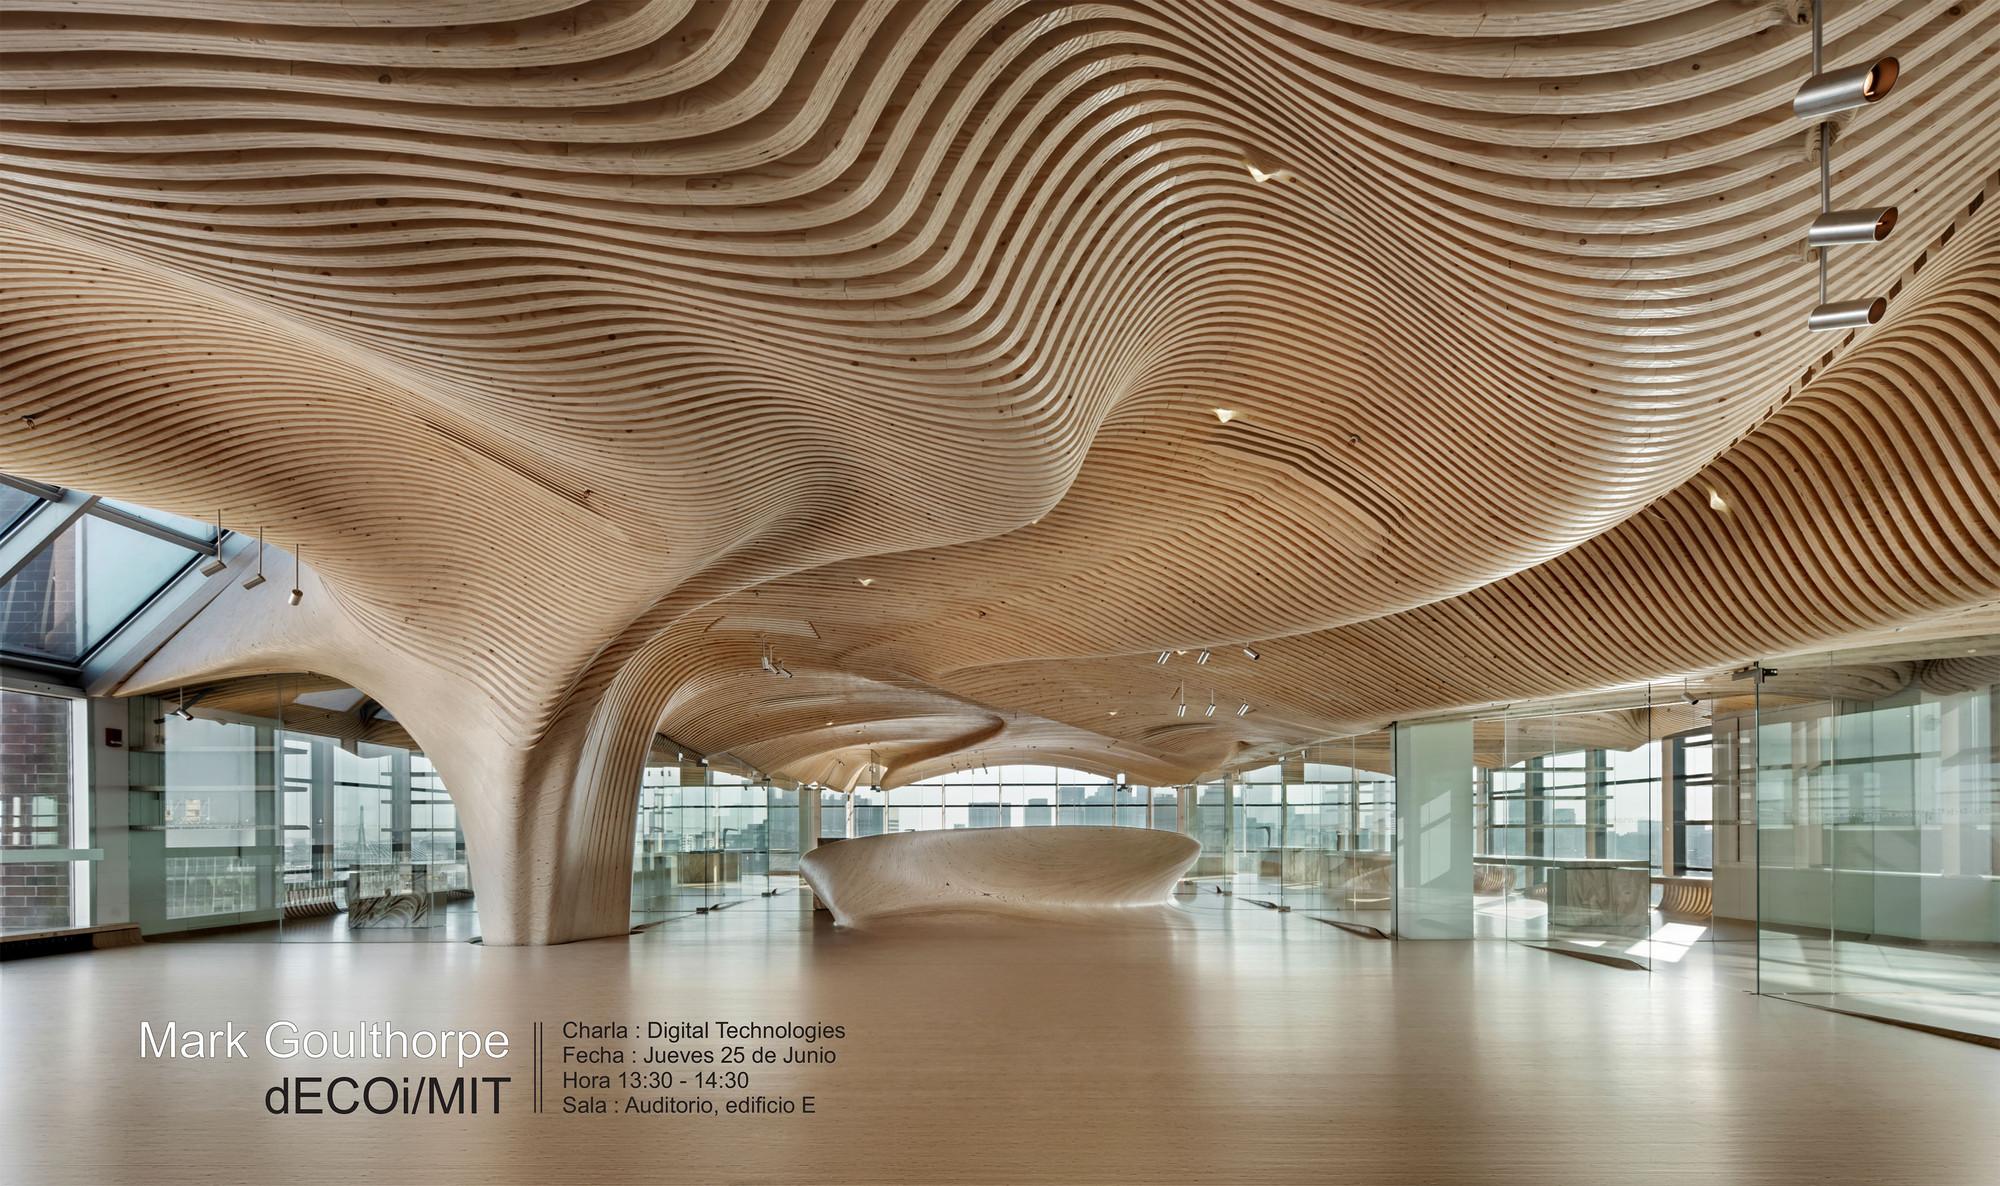 Conferencia de Mark Goulthorpe [dECOi/MIT]: Design Technologies / Santiago, Mark Goulthorpe